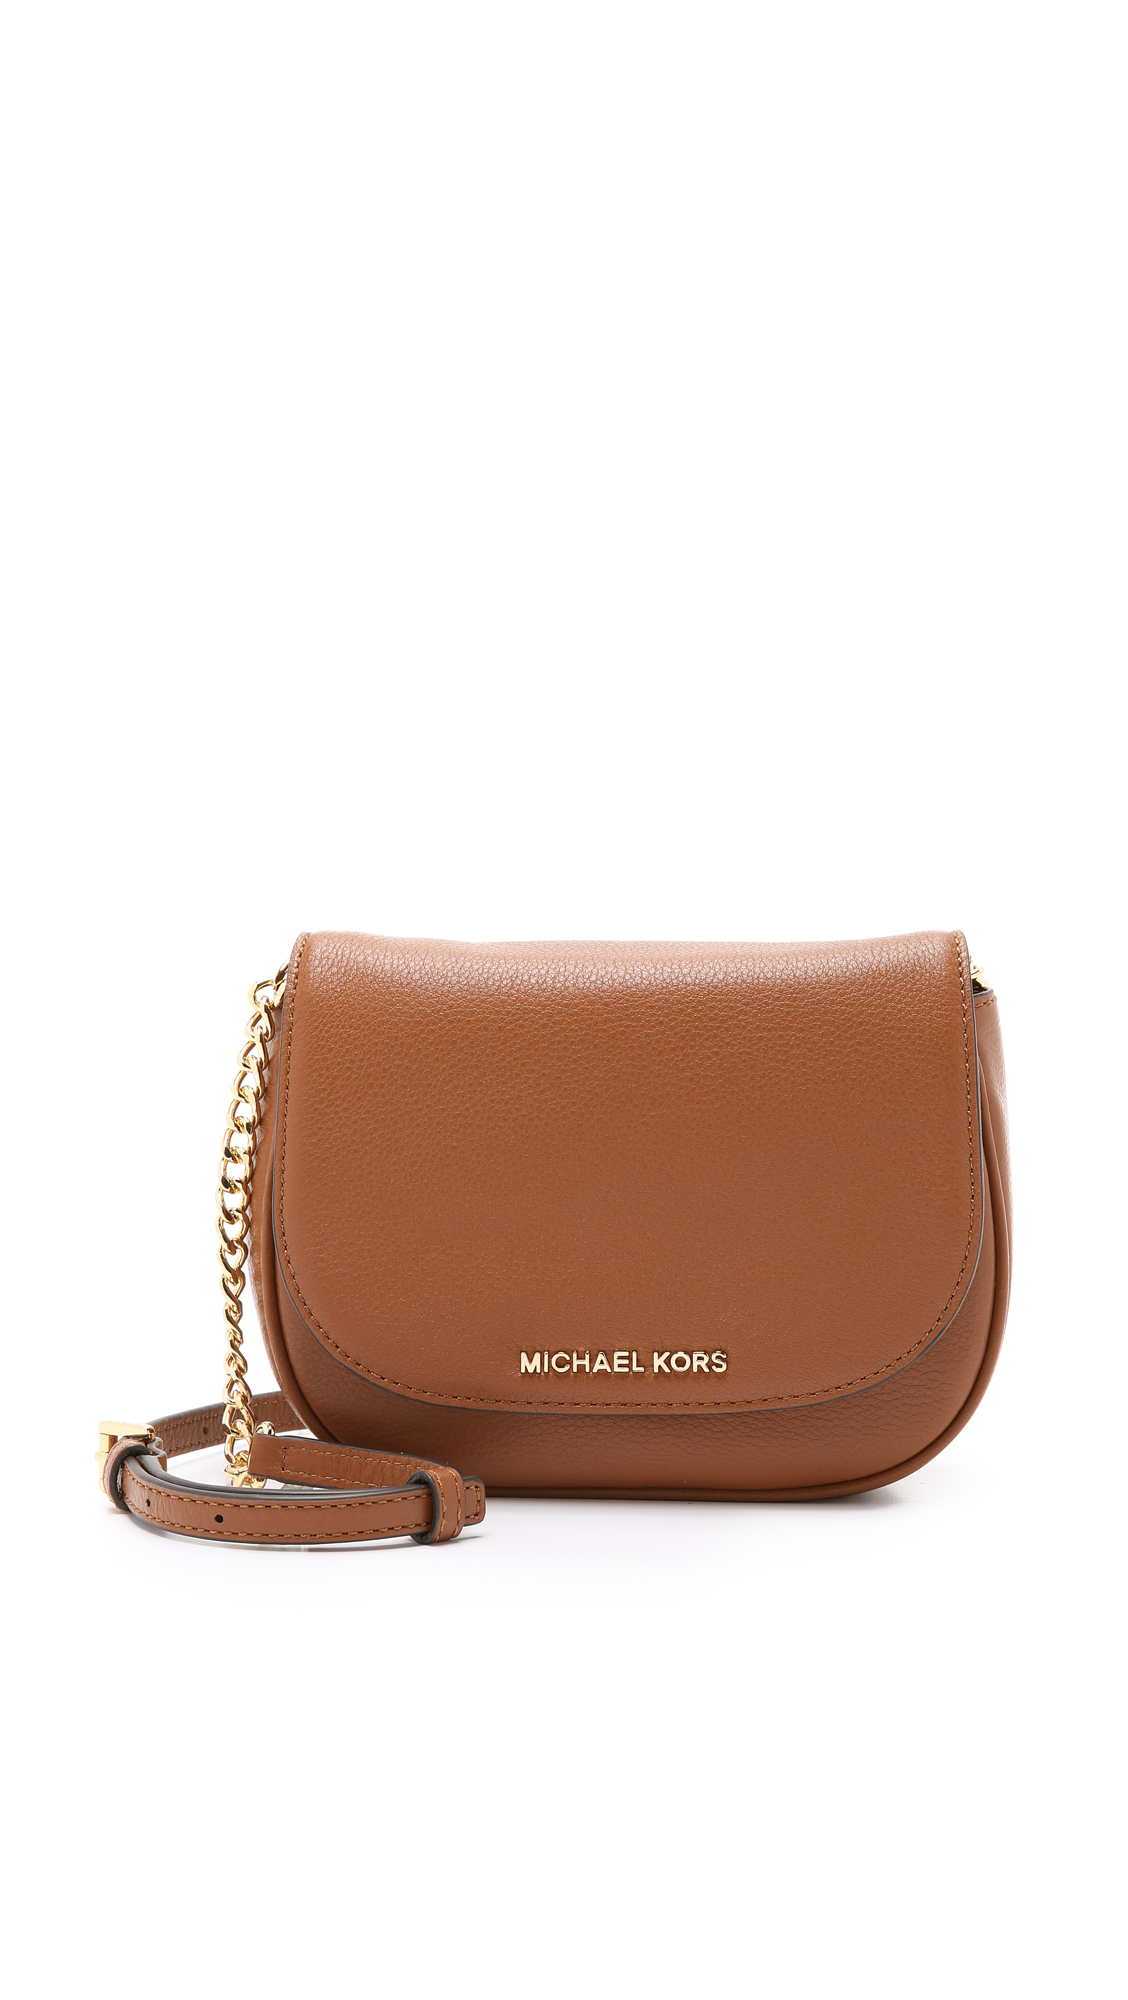 23dfe4782bd9 italy michael kors small brown purse 86a41 702d8; czech lyst michael  michael kors bedford small cross body bag luggage 562ec d4a9b